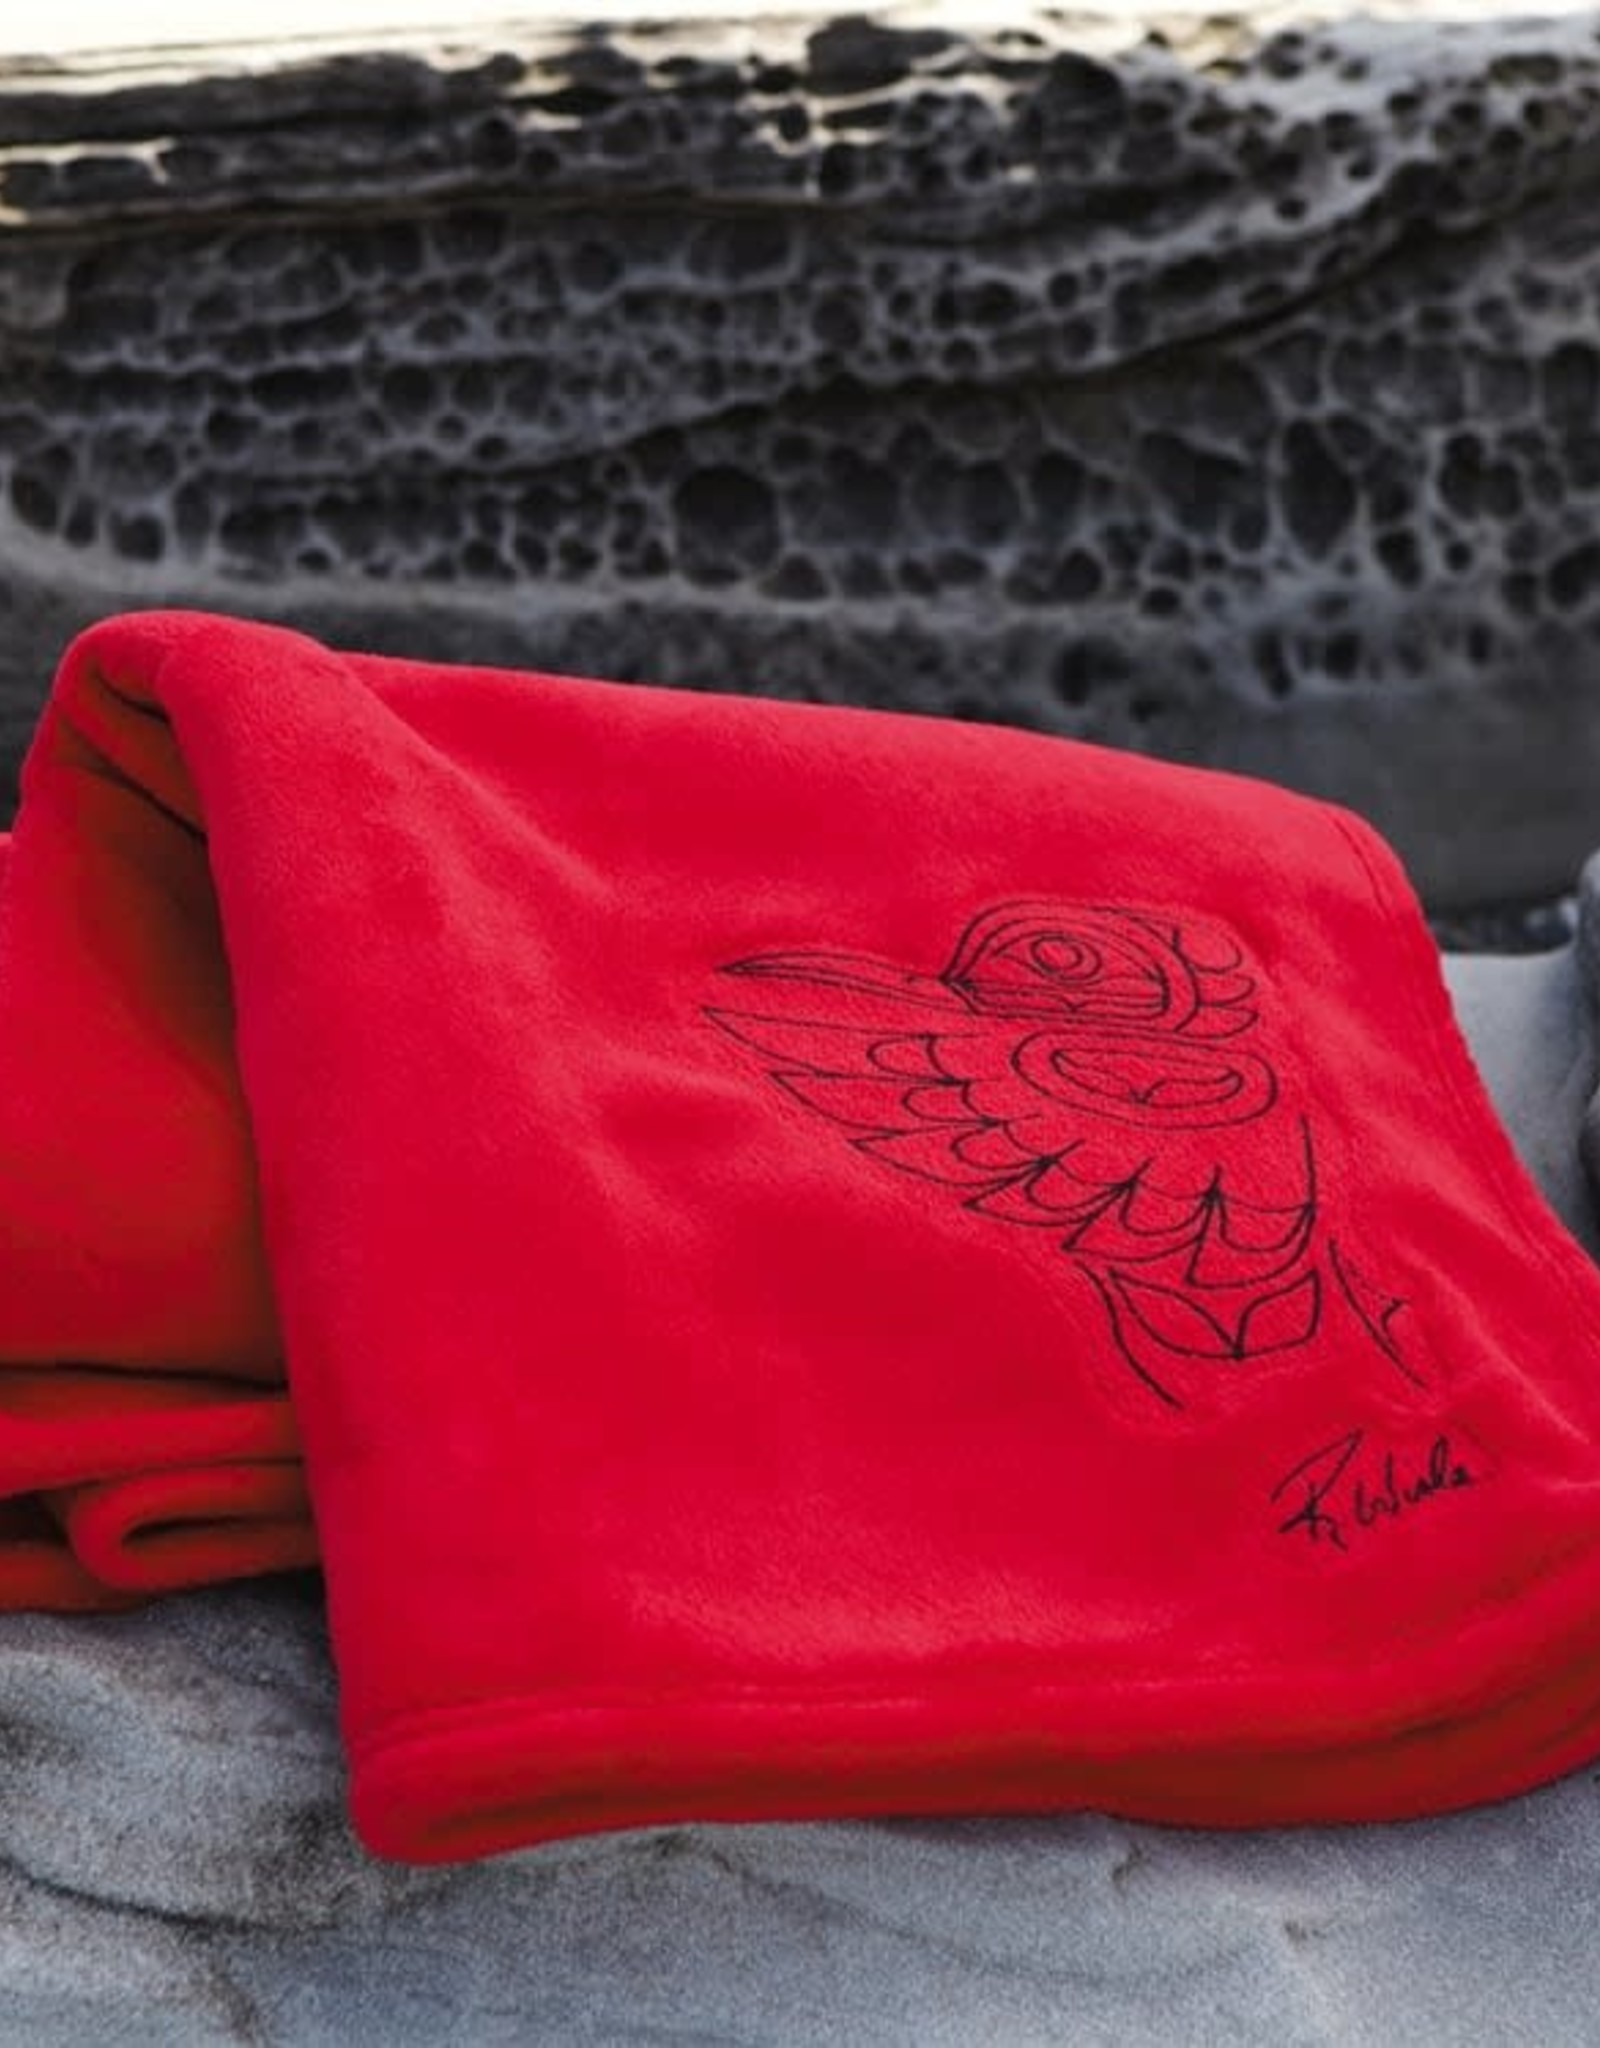 Kanata Velura Embroidered Blanket